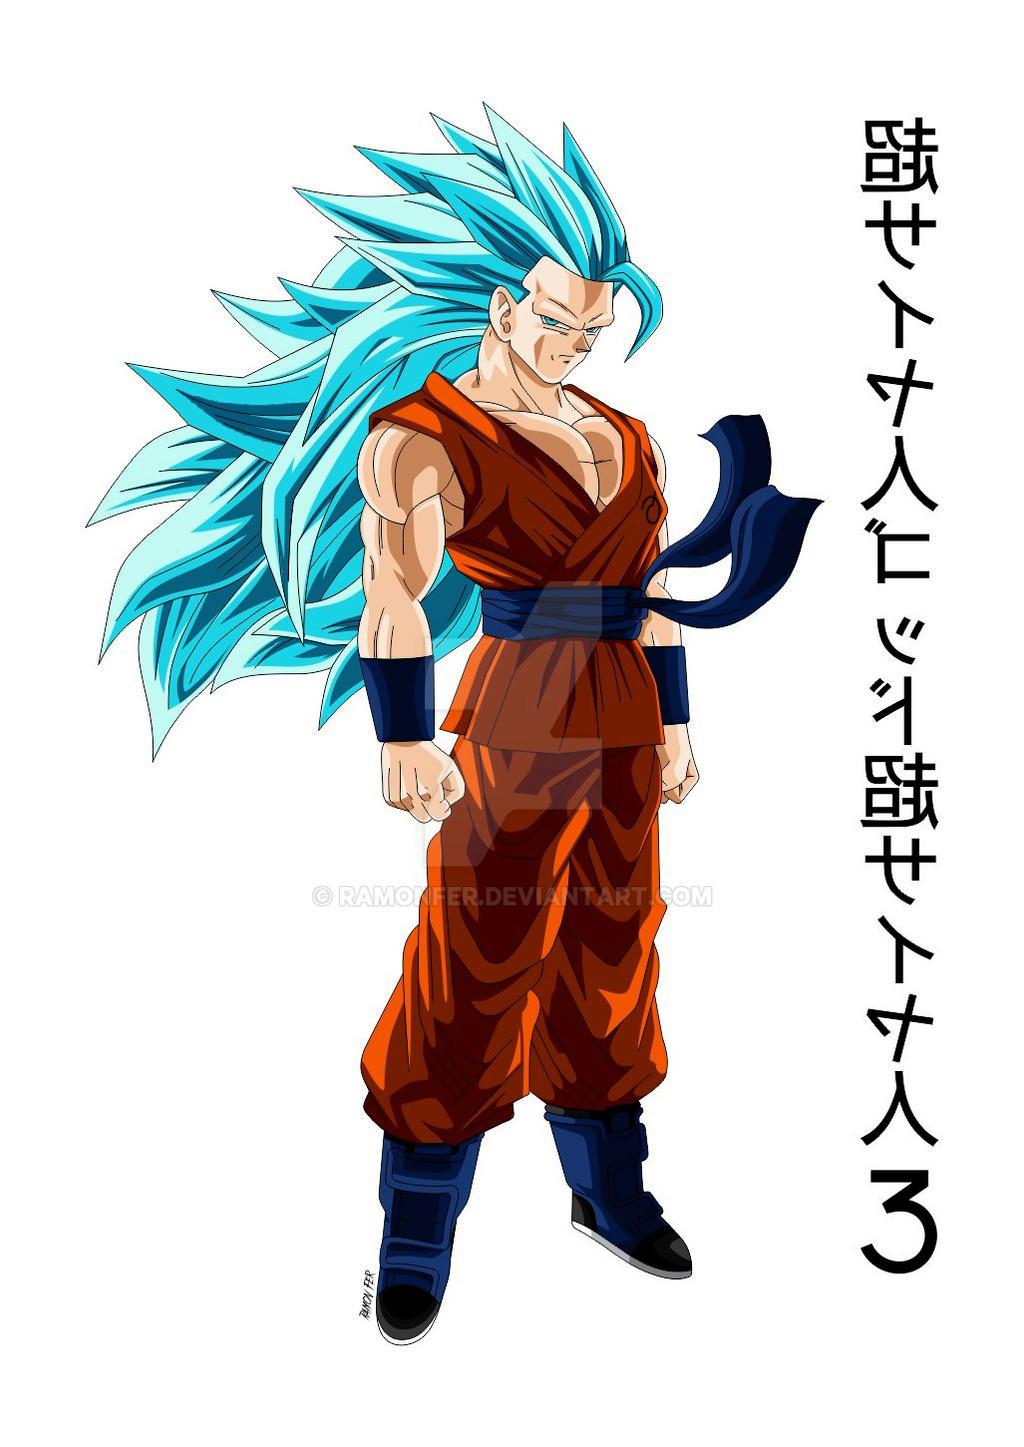 Goku super saiyan god super saiyan 3 by ramonfer on deviantart - Sangoku super saiyan god ...